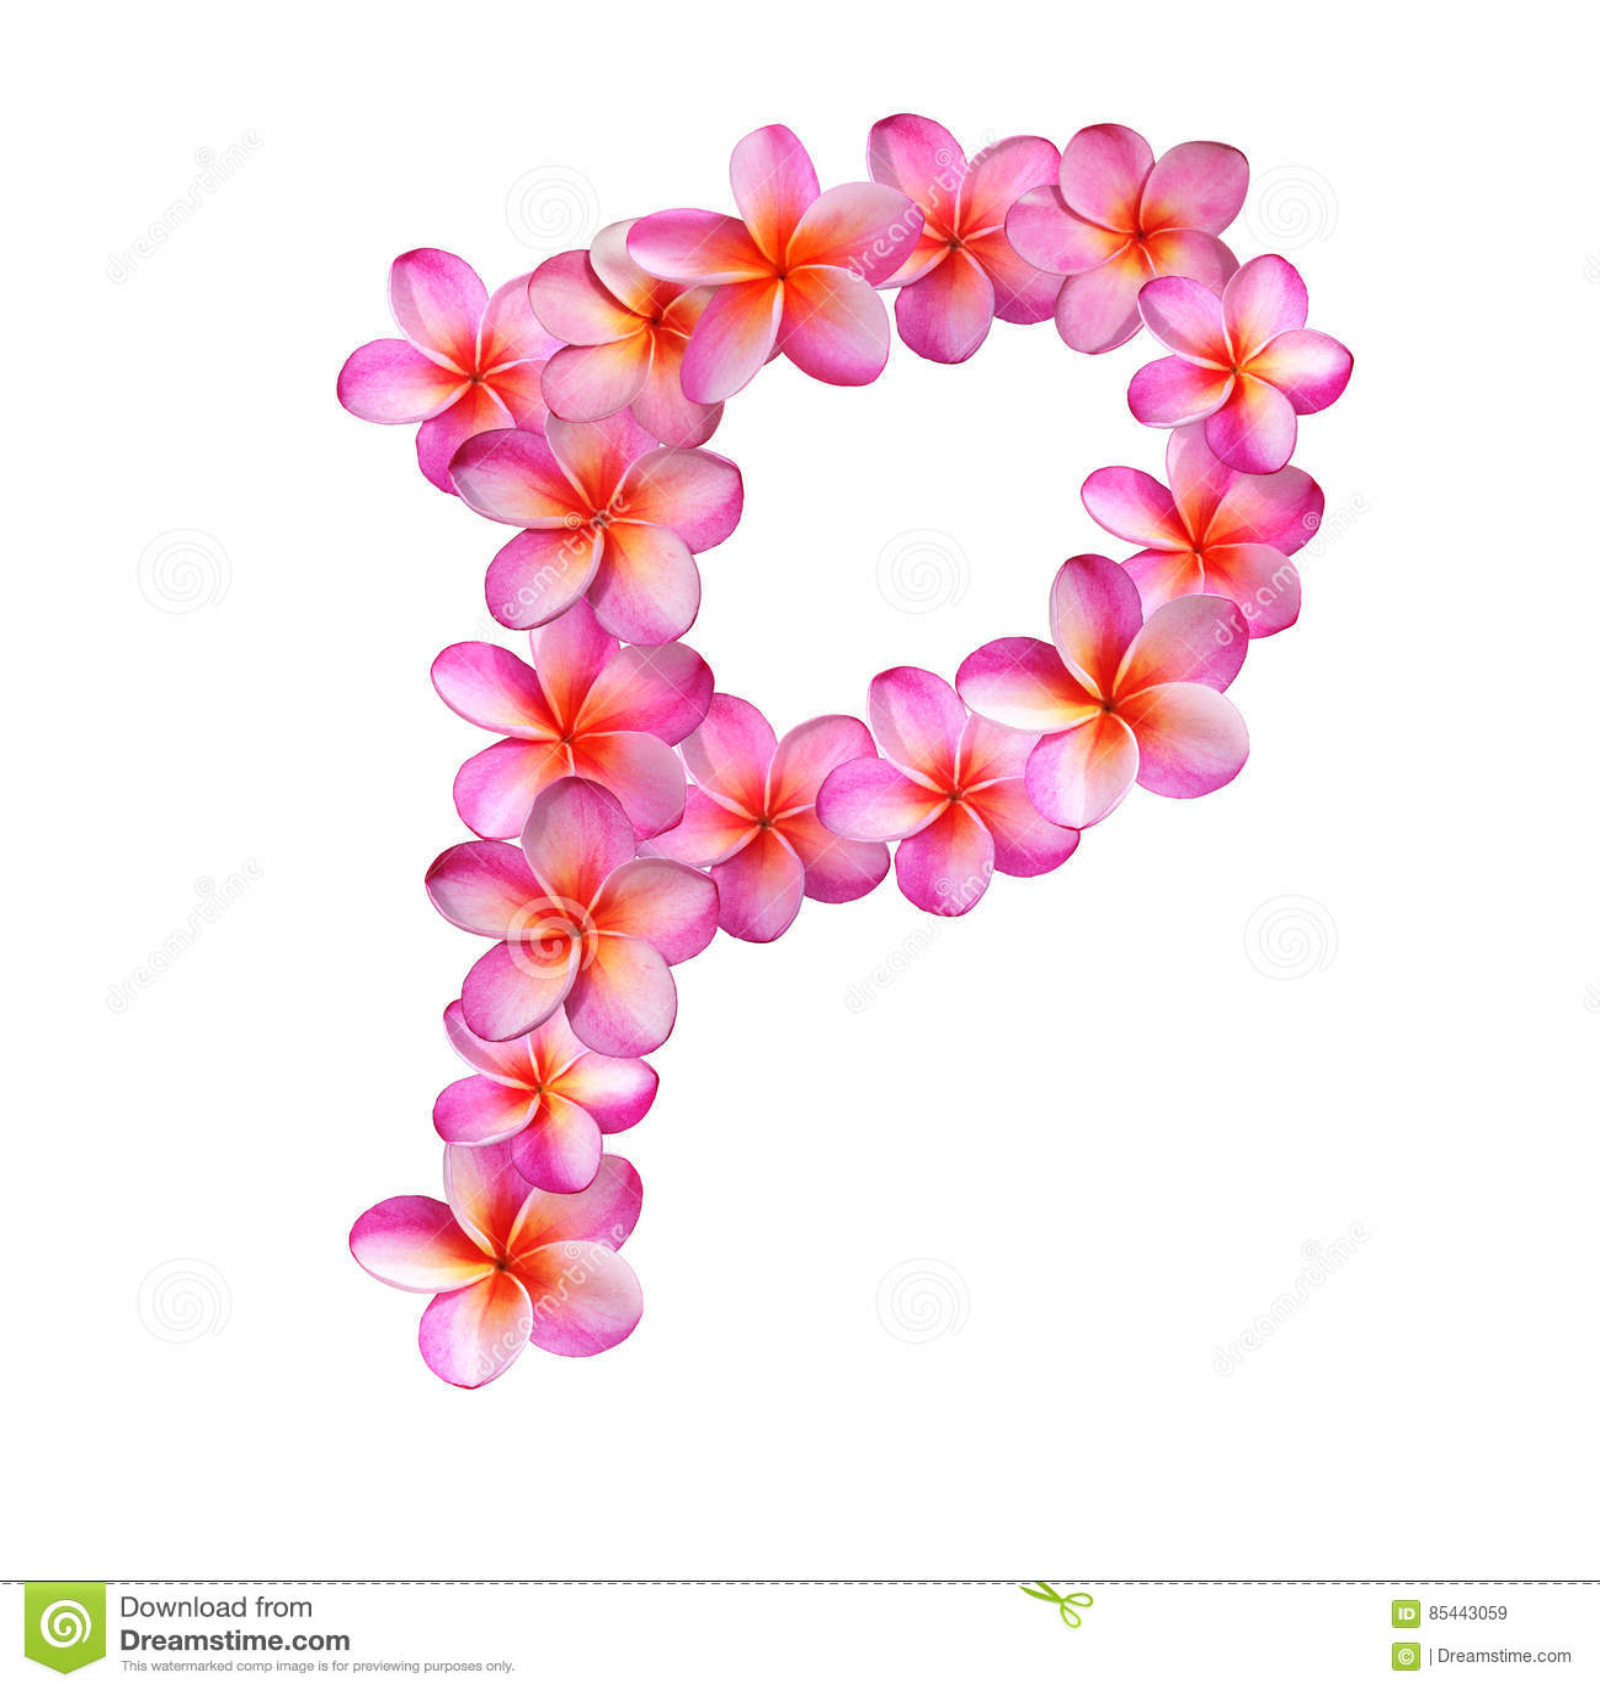 Pink Plumeria Flowers Letter P Stock Illustration - Illustration of ...